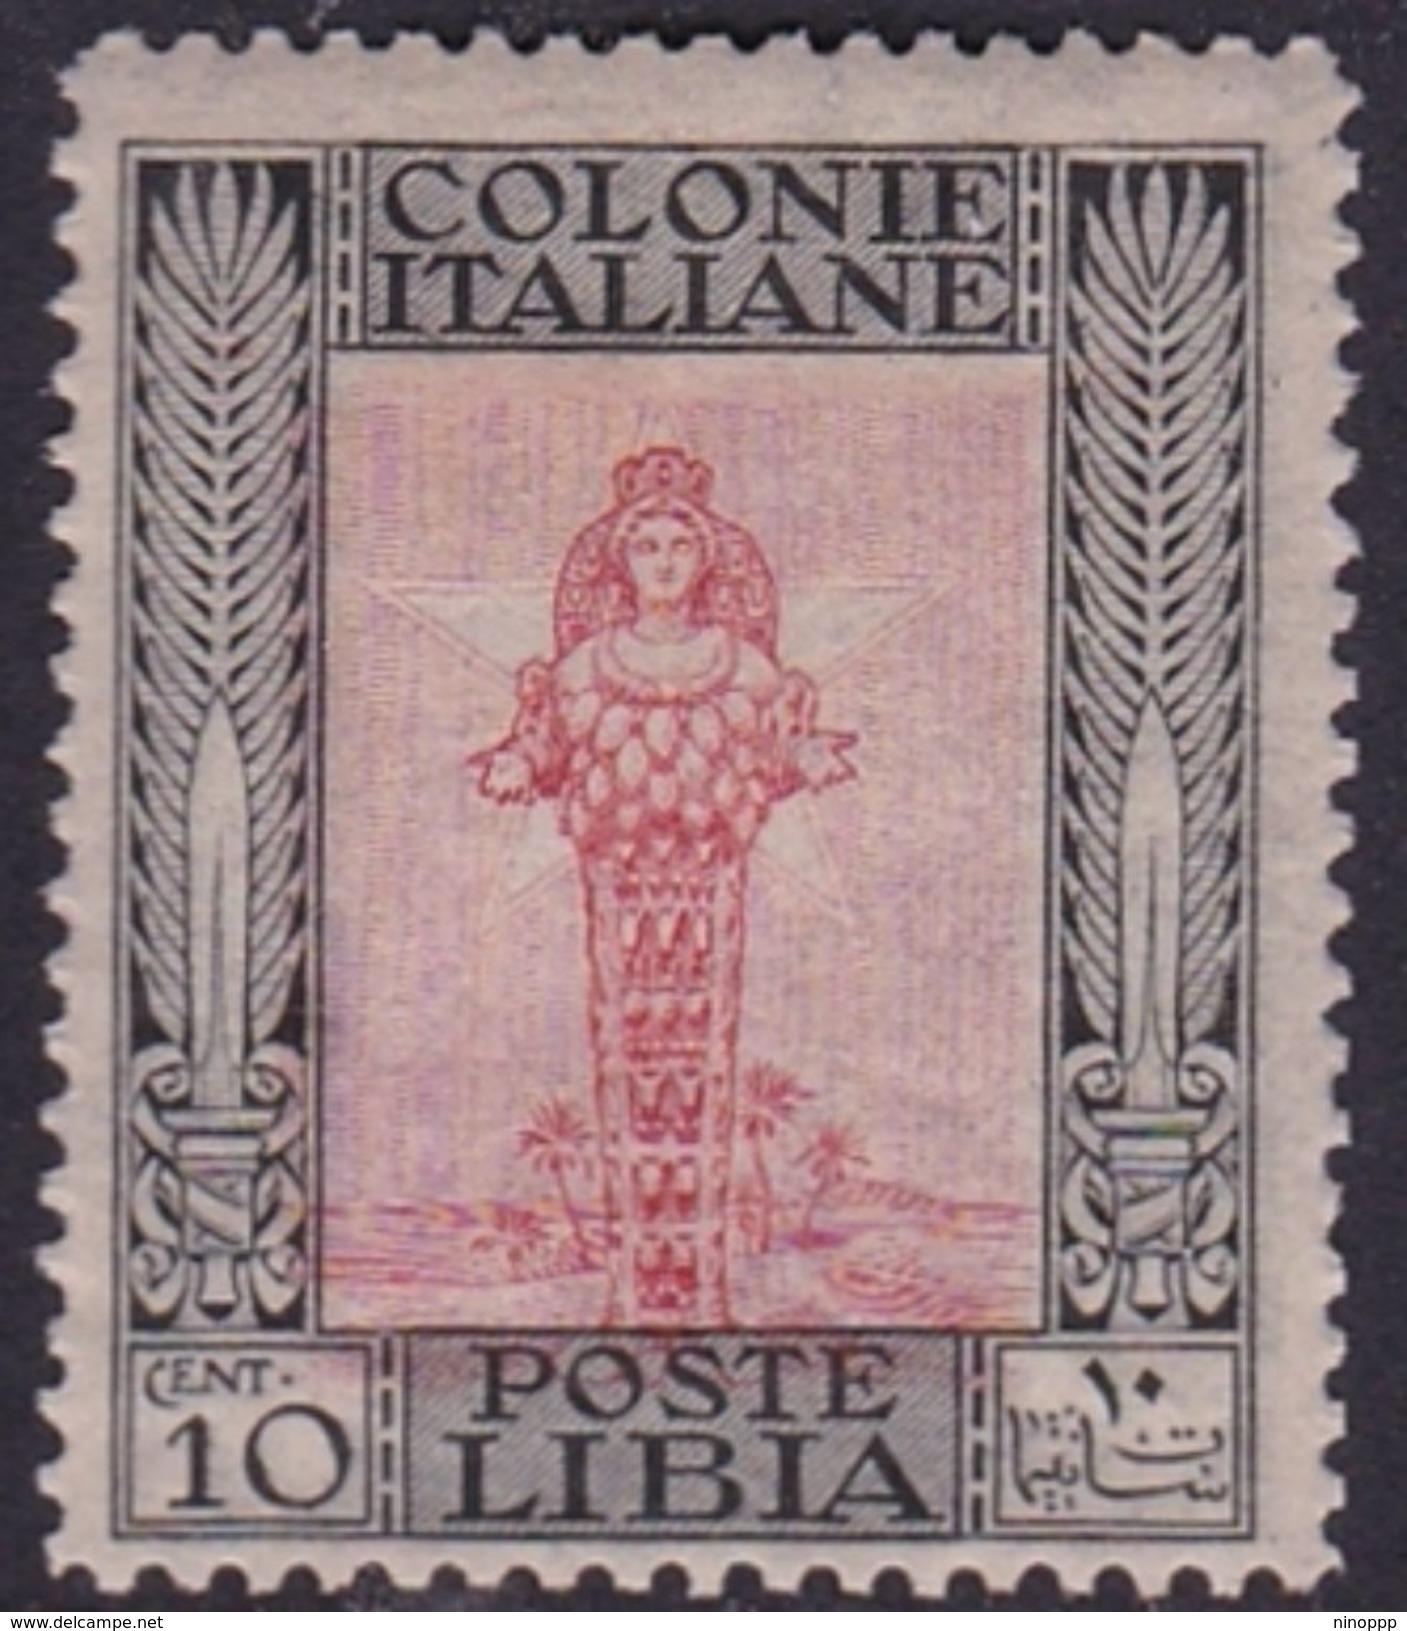 Italy-Colonies And Territories-Libya S 24 1921 ,Pictorials, 1c Diana Of Ephesus,Mint Hinged - Libya